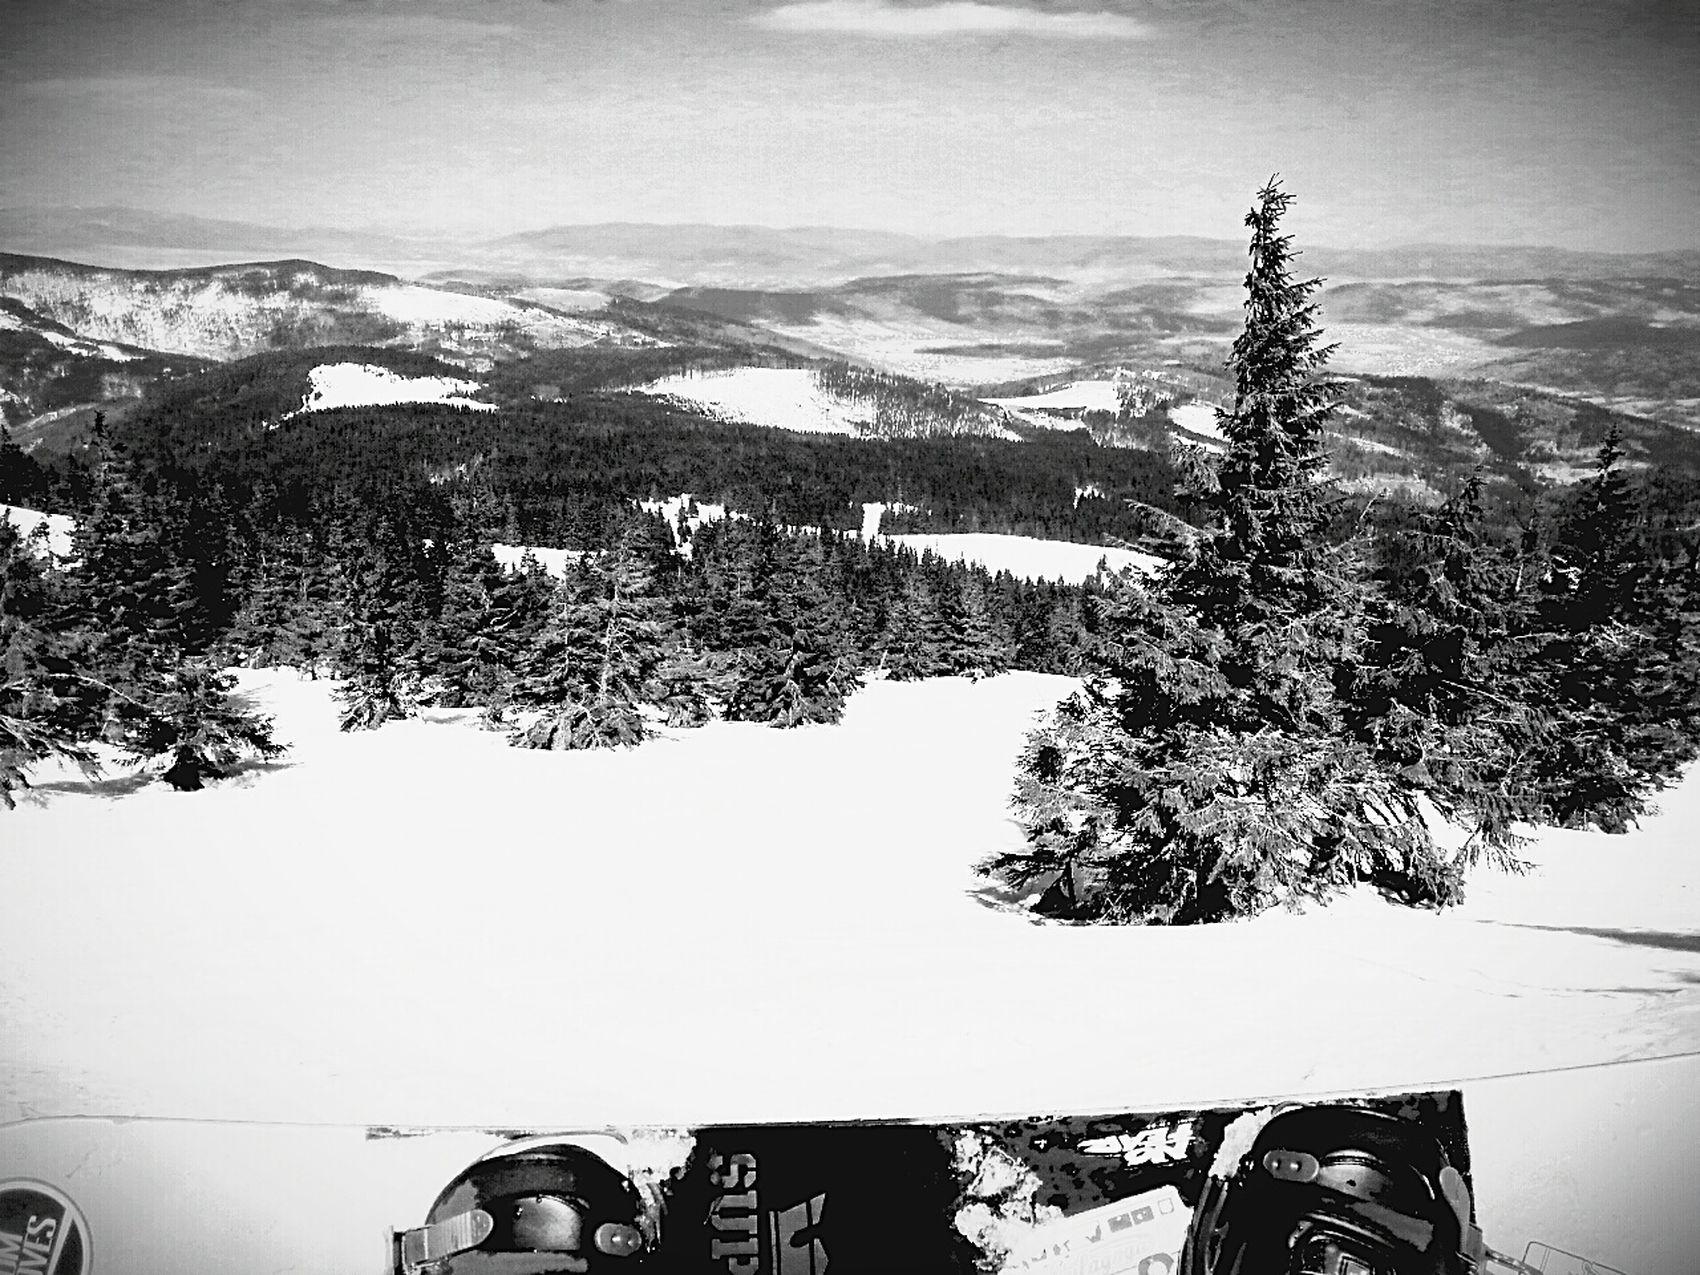 Poland Pilsko Snowboarding Snowboard Theendofseason Forest View Enjoying The View